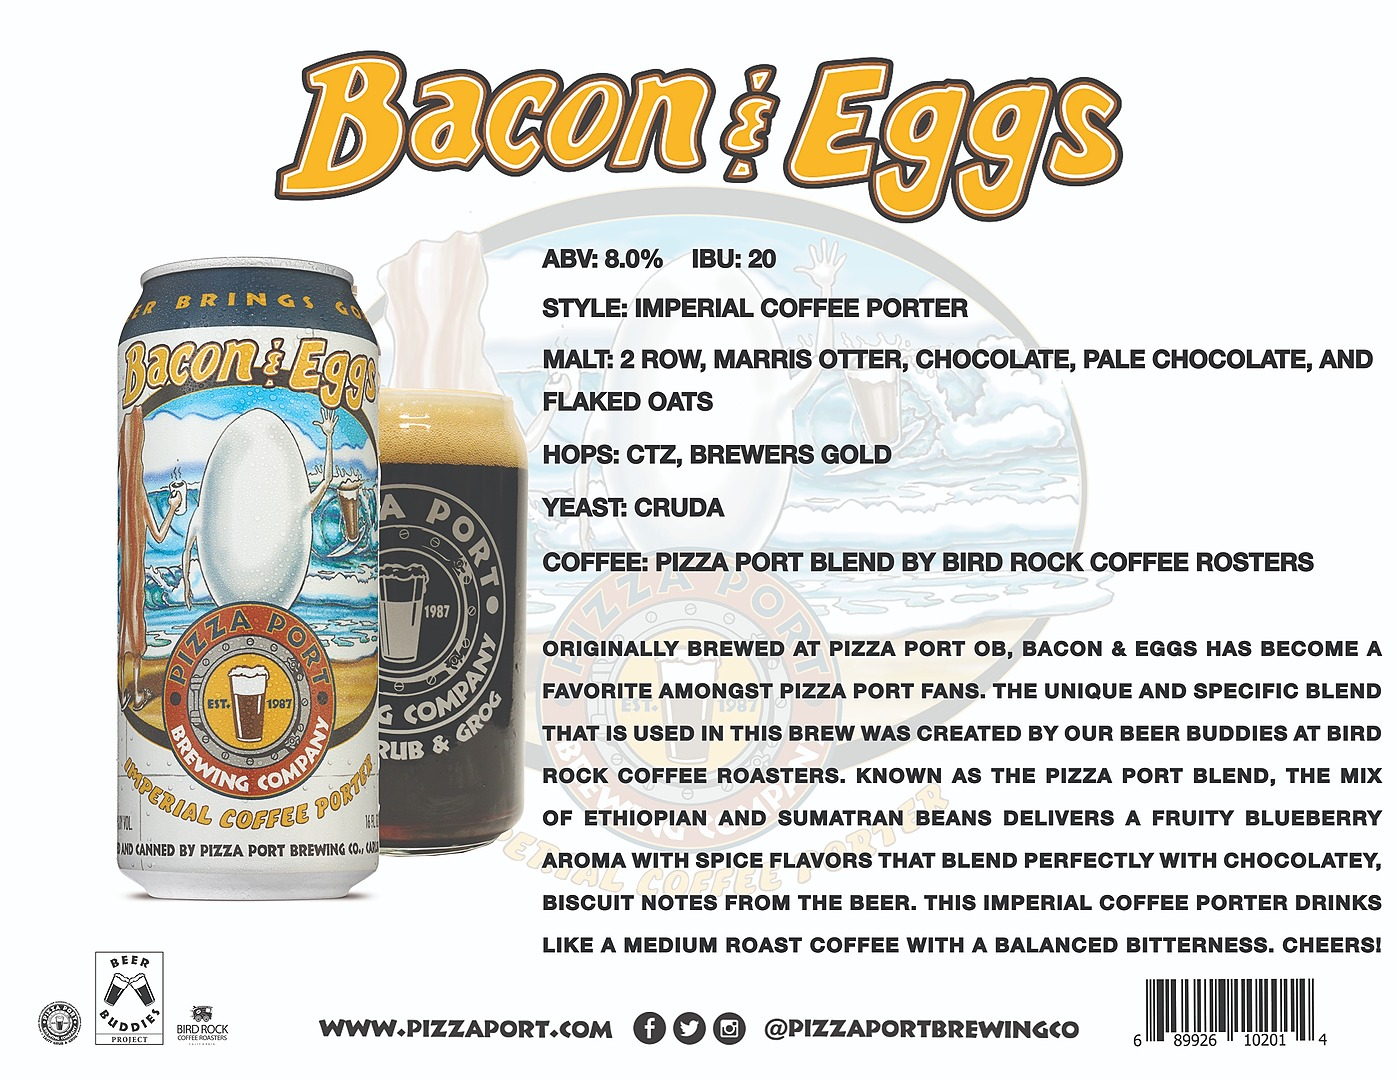 Bacon & Eggs Imperial Coffee Porter